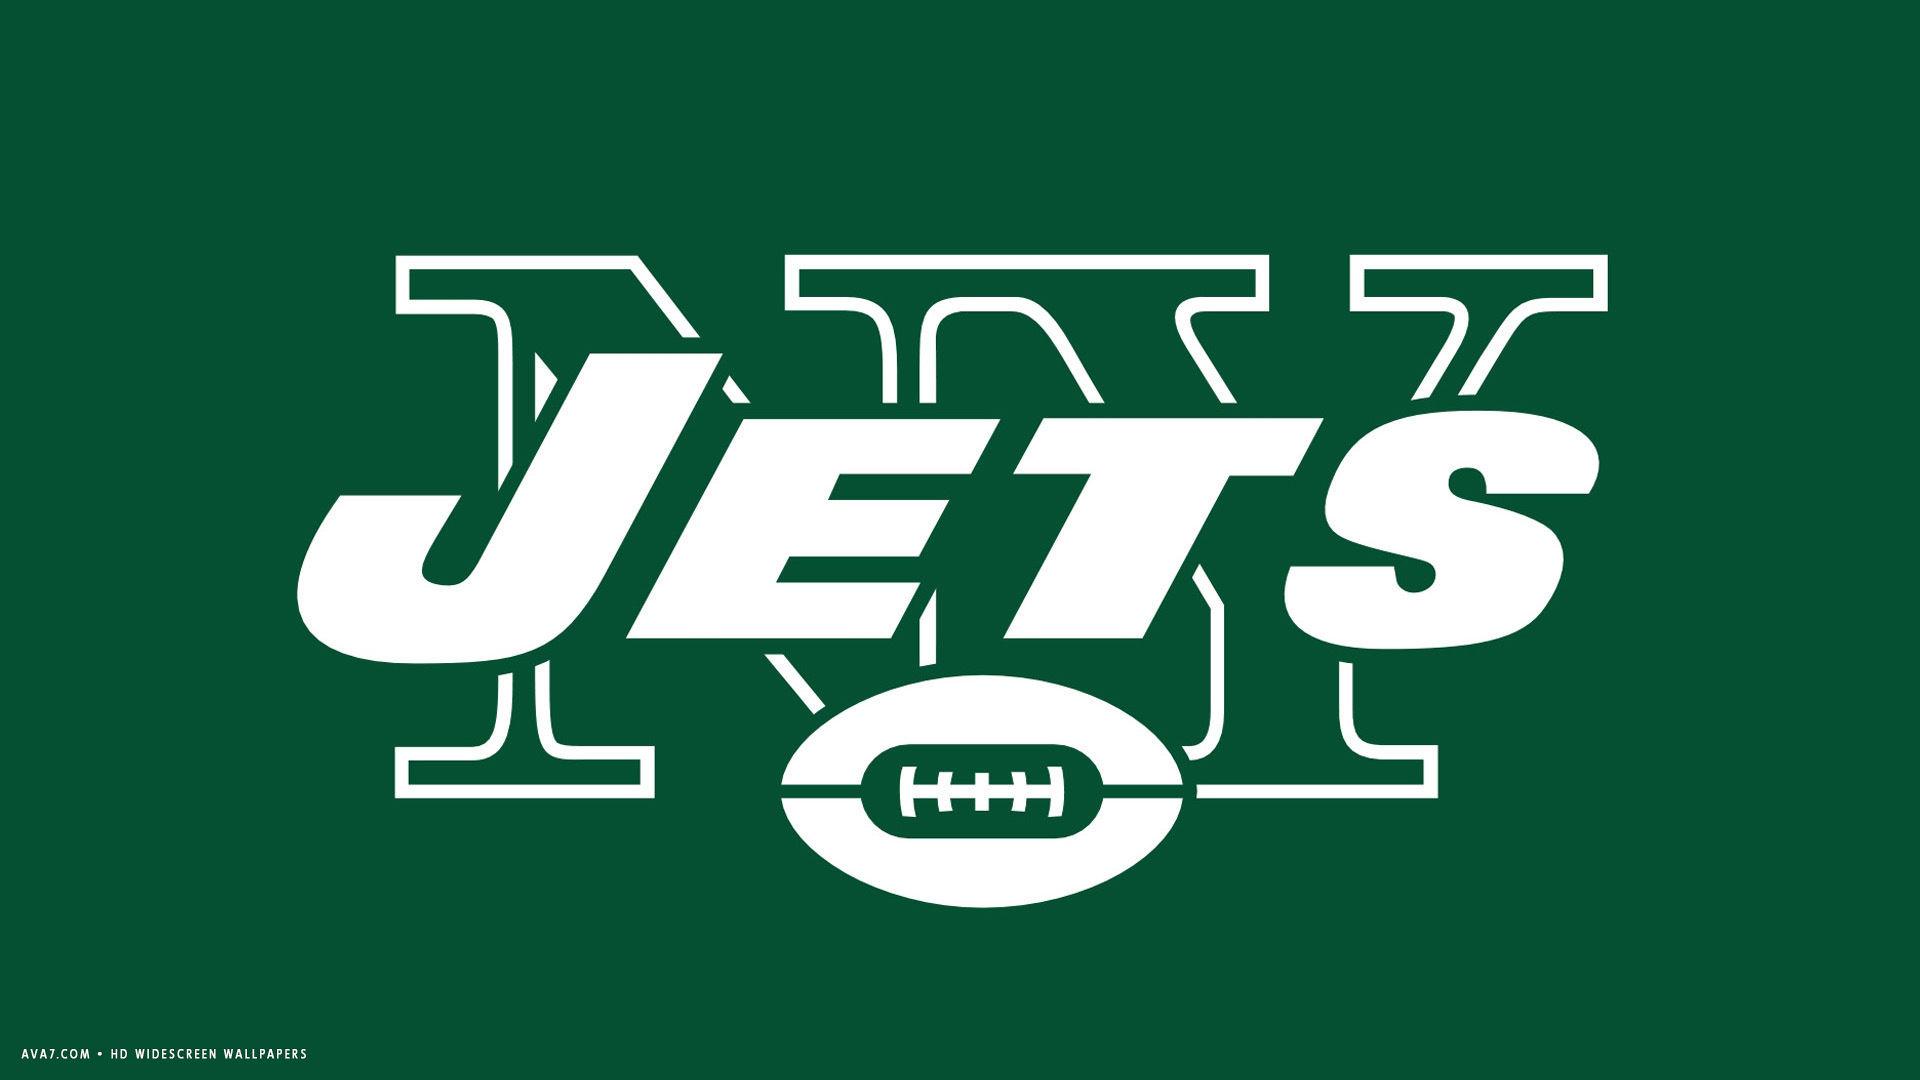 New York Jets Wallpaper New York Jets Logo 2018 1555014 Hd